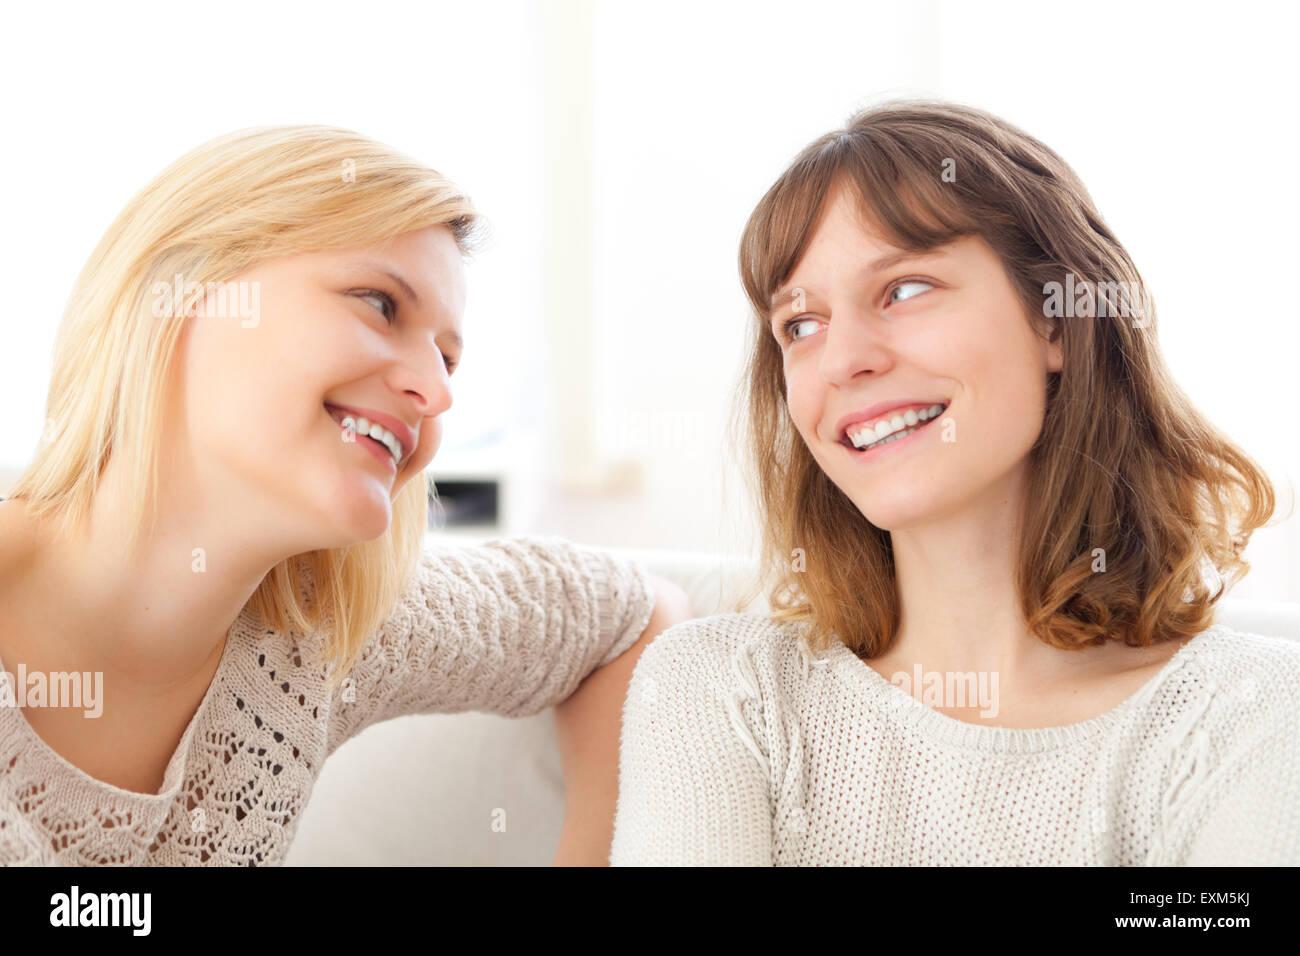 Complicity scene beetwen best friends - Friendship concept - Stock Image